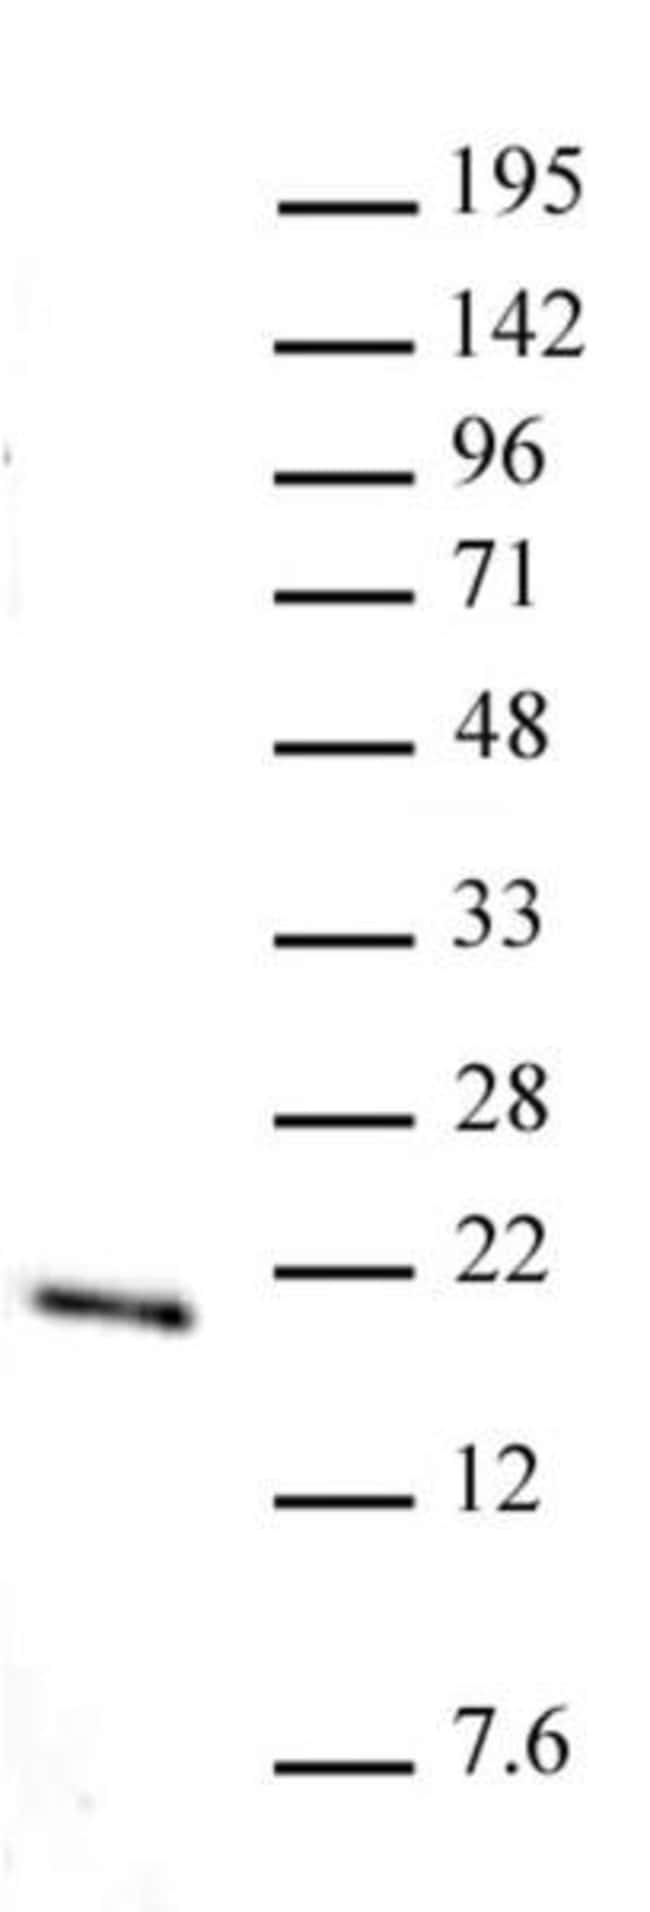 Histone H3K36me1 Rabbit anti-Human, Unconjugated, Polyclonal, Active Motif:Antibodies:Primary